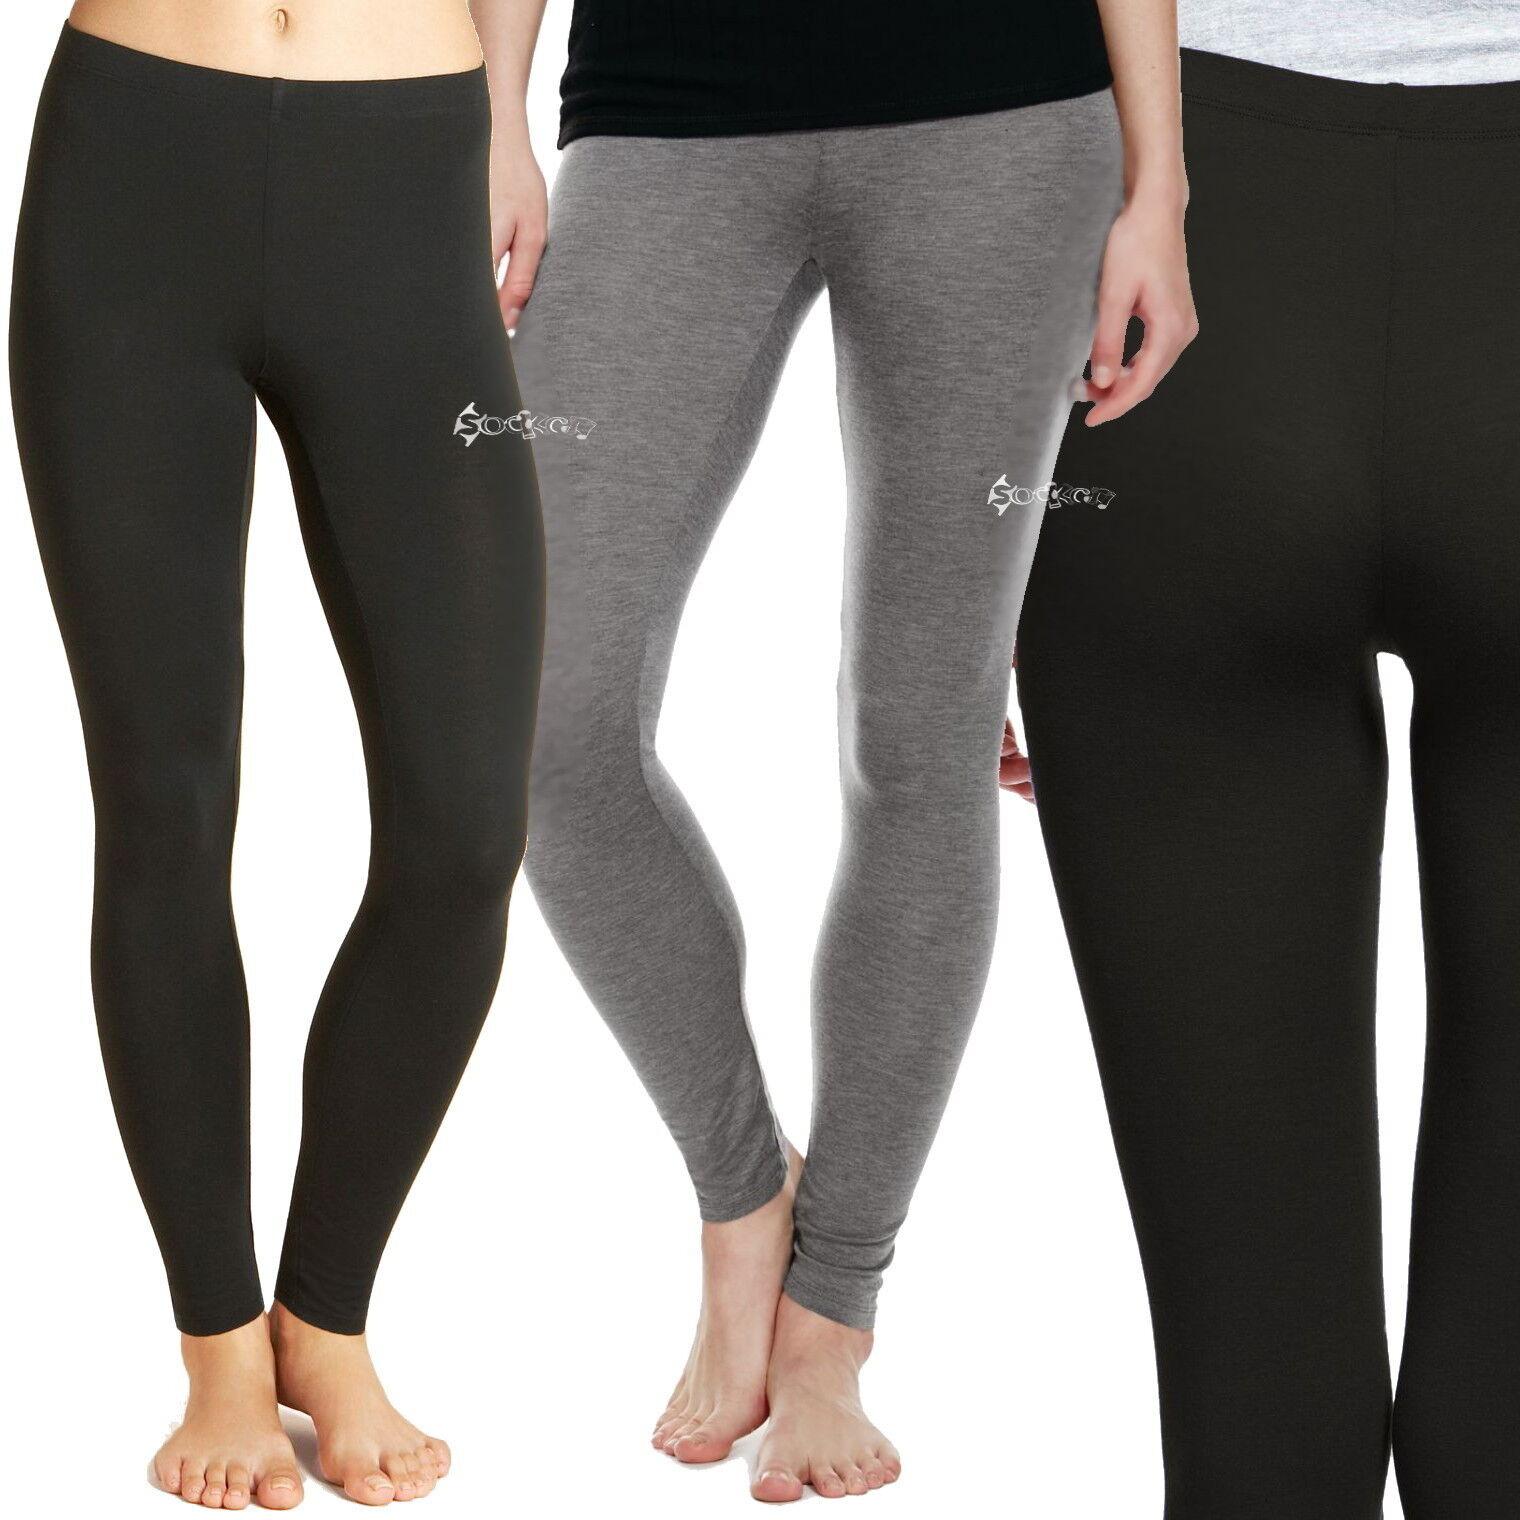 Ladies Ex M&S Heatgen Thermal Leggings Sizes 6-24 Black Grey